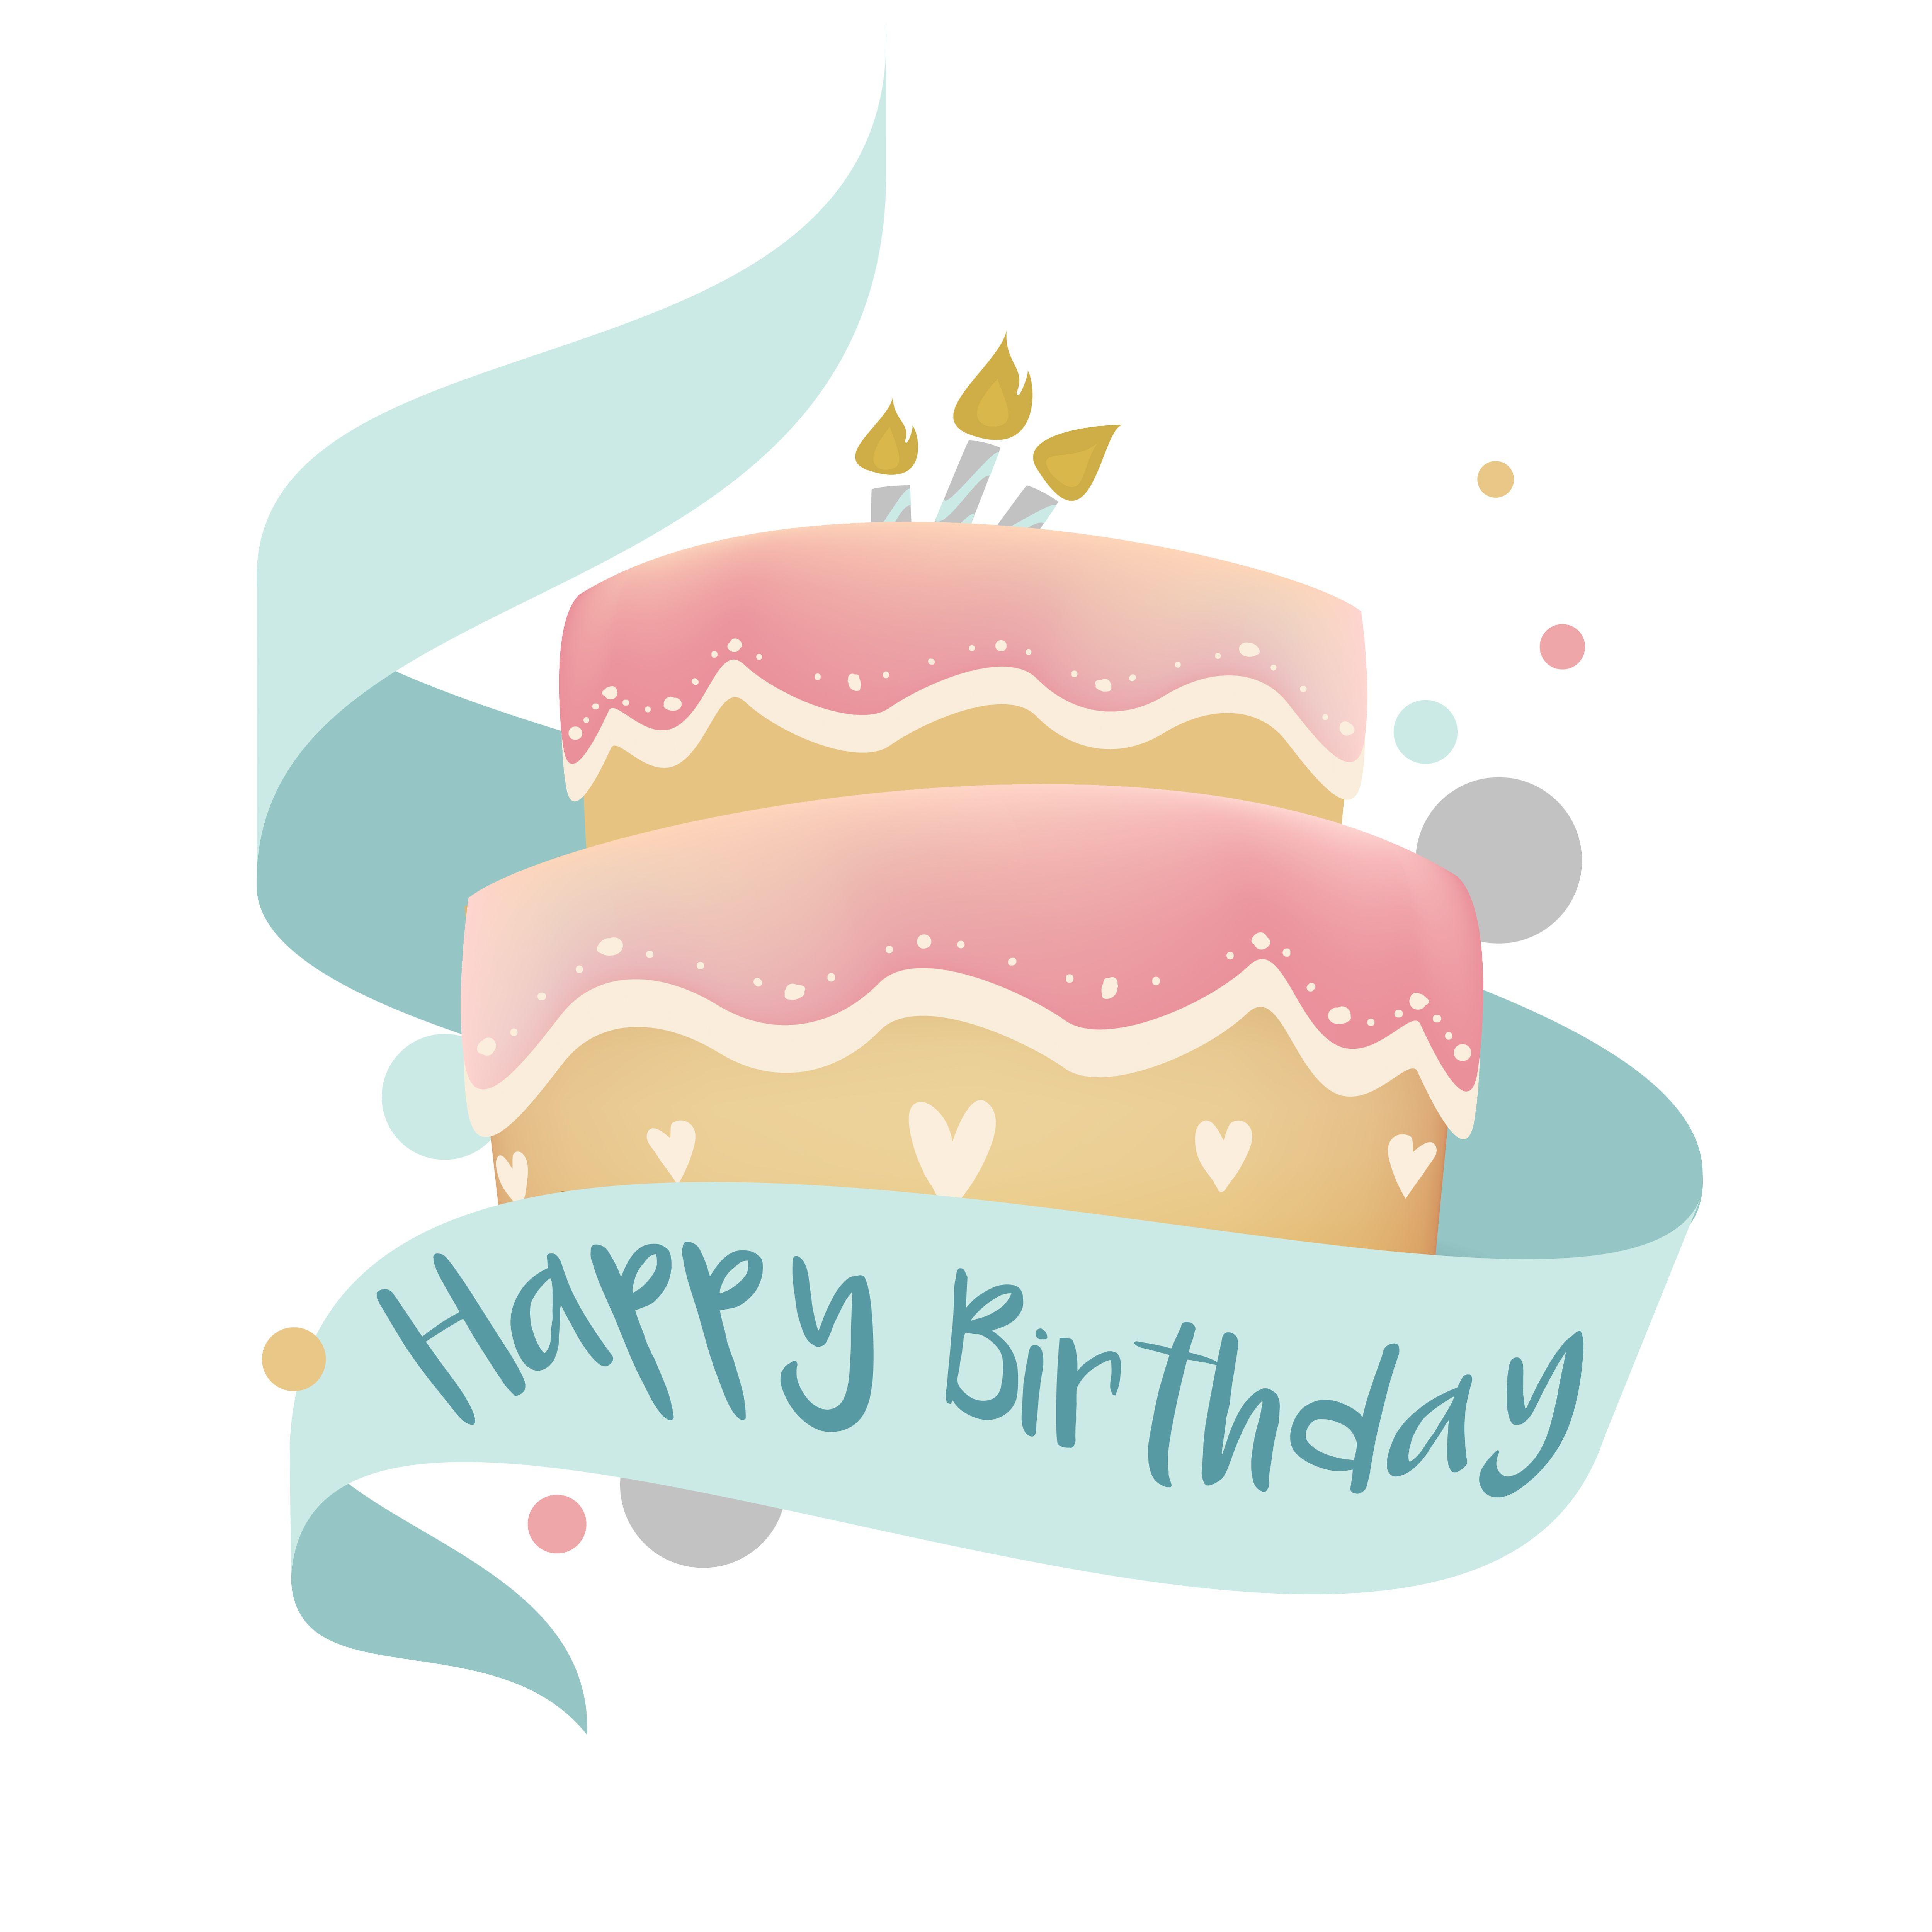 Happy Birthday Cake Design Vector Happy Birthday Illustration Happy Birthday Card Design Birthday Cake Illustration